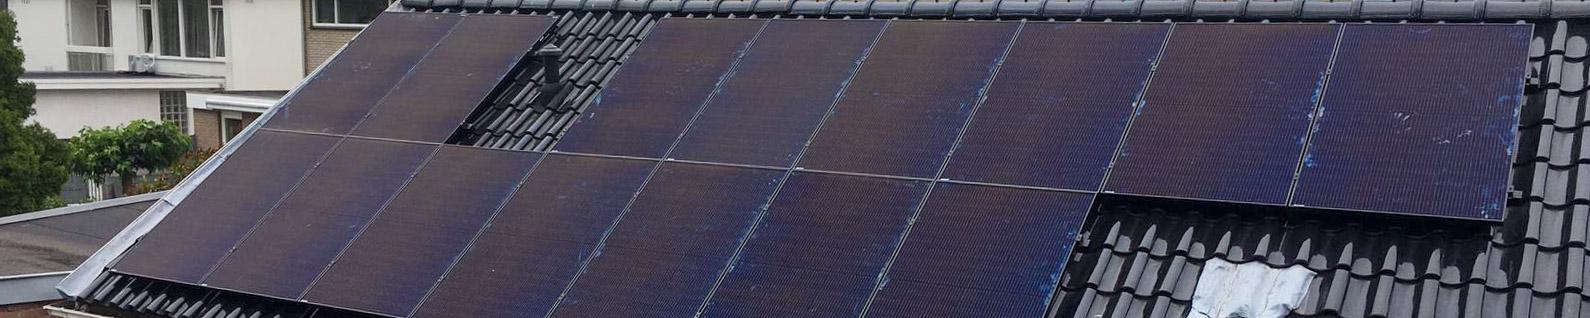 VDP Techniek zonnepanelen